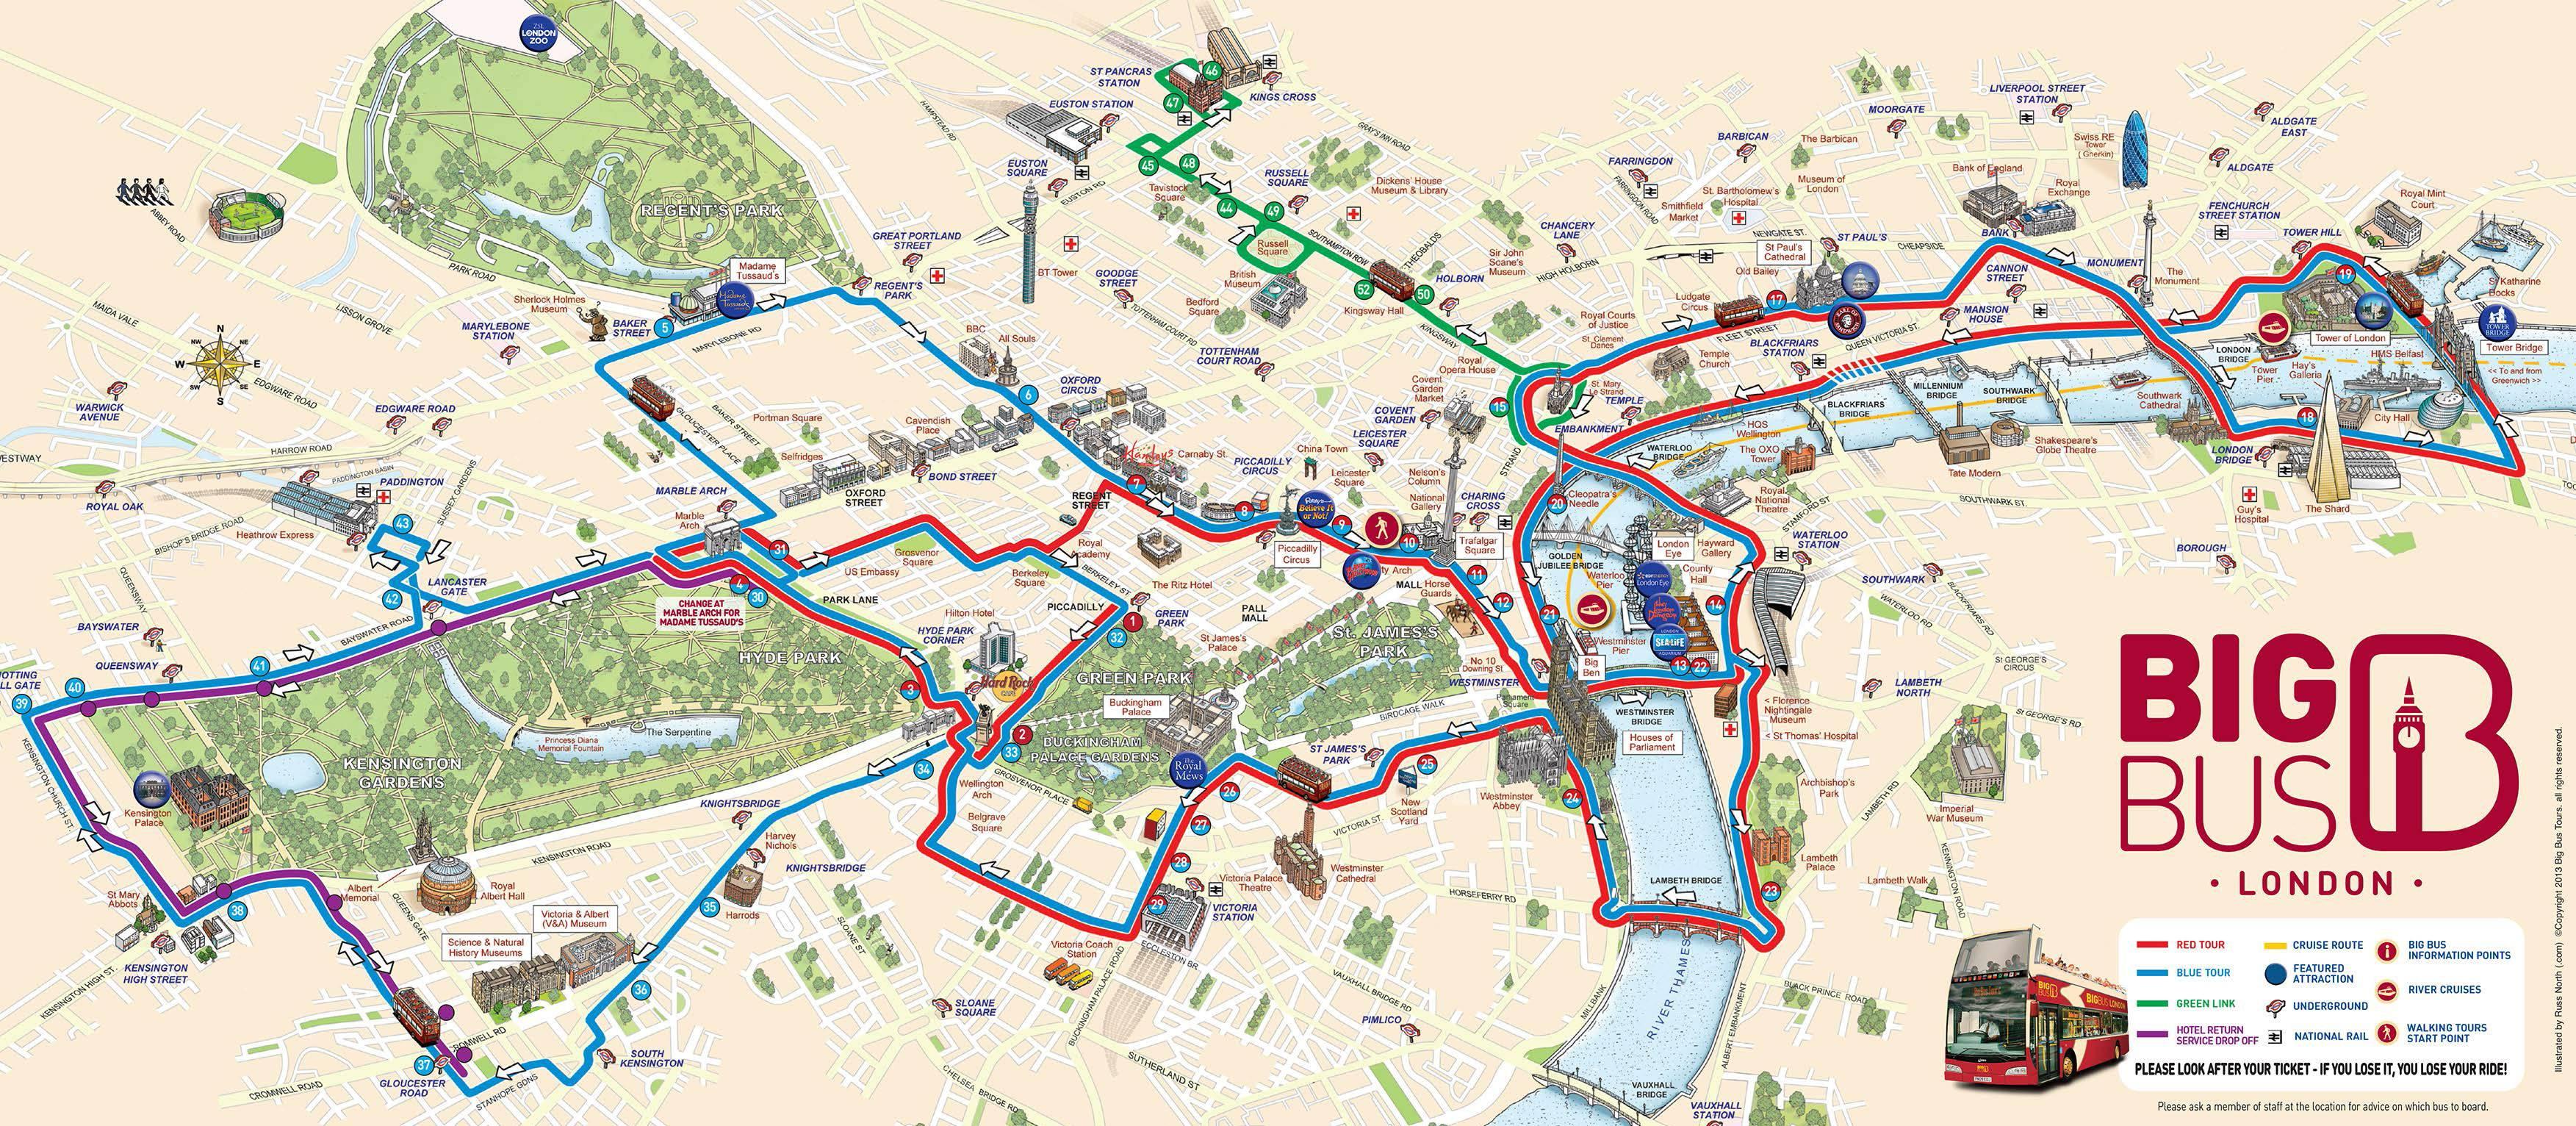 Carte de Londres - Touristique